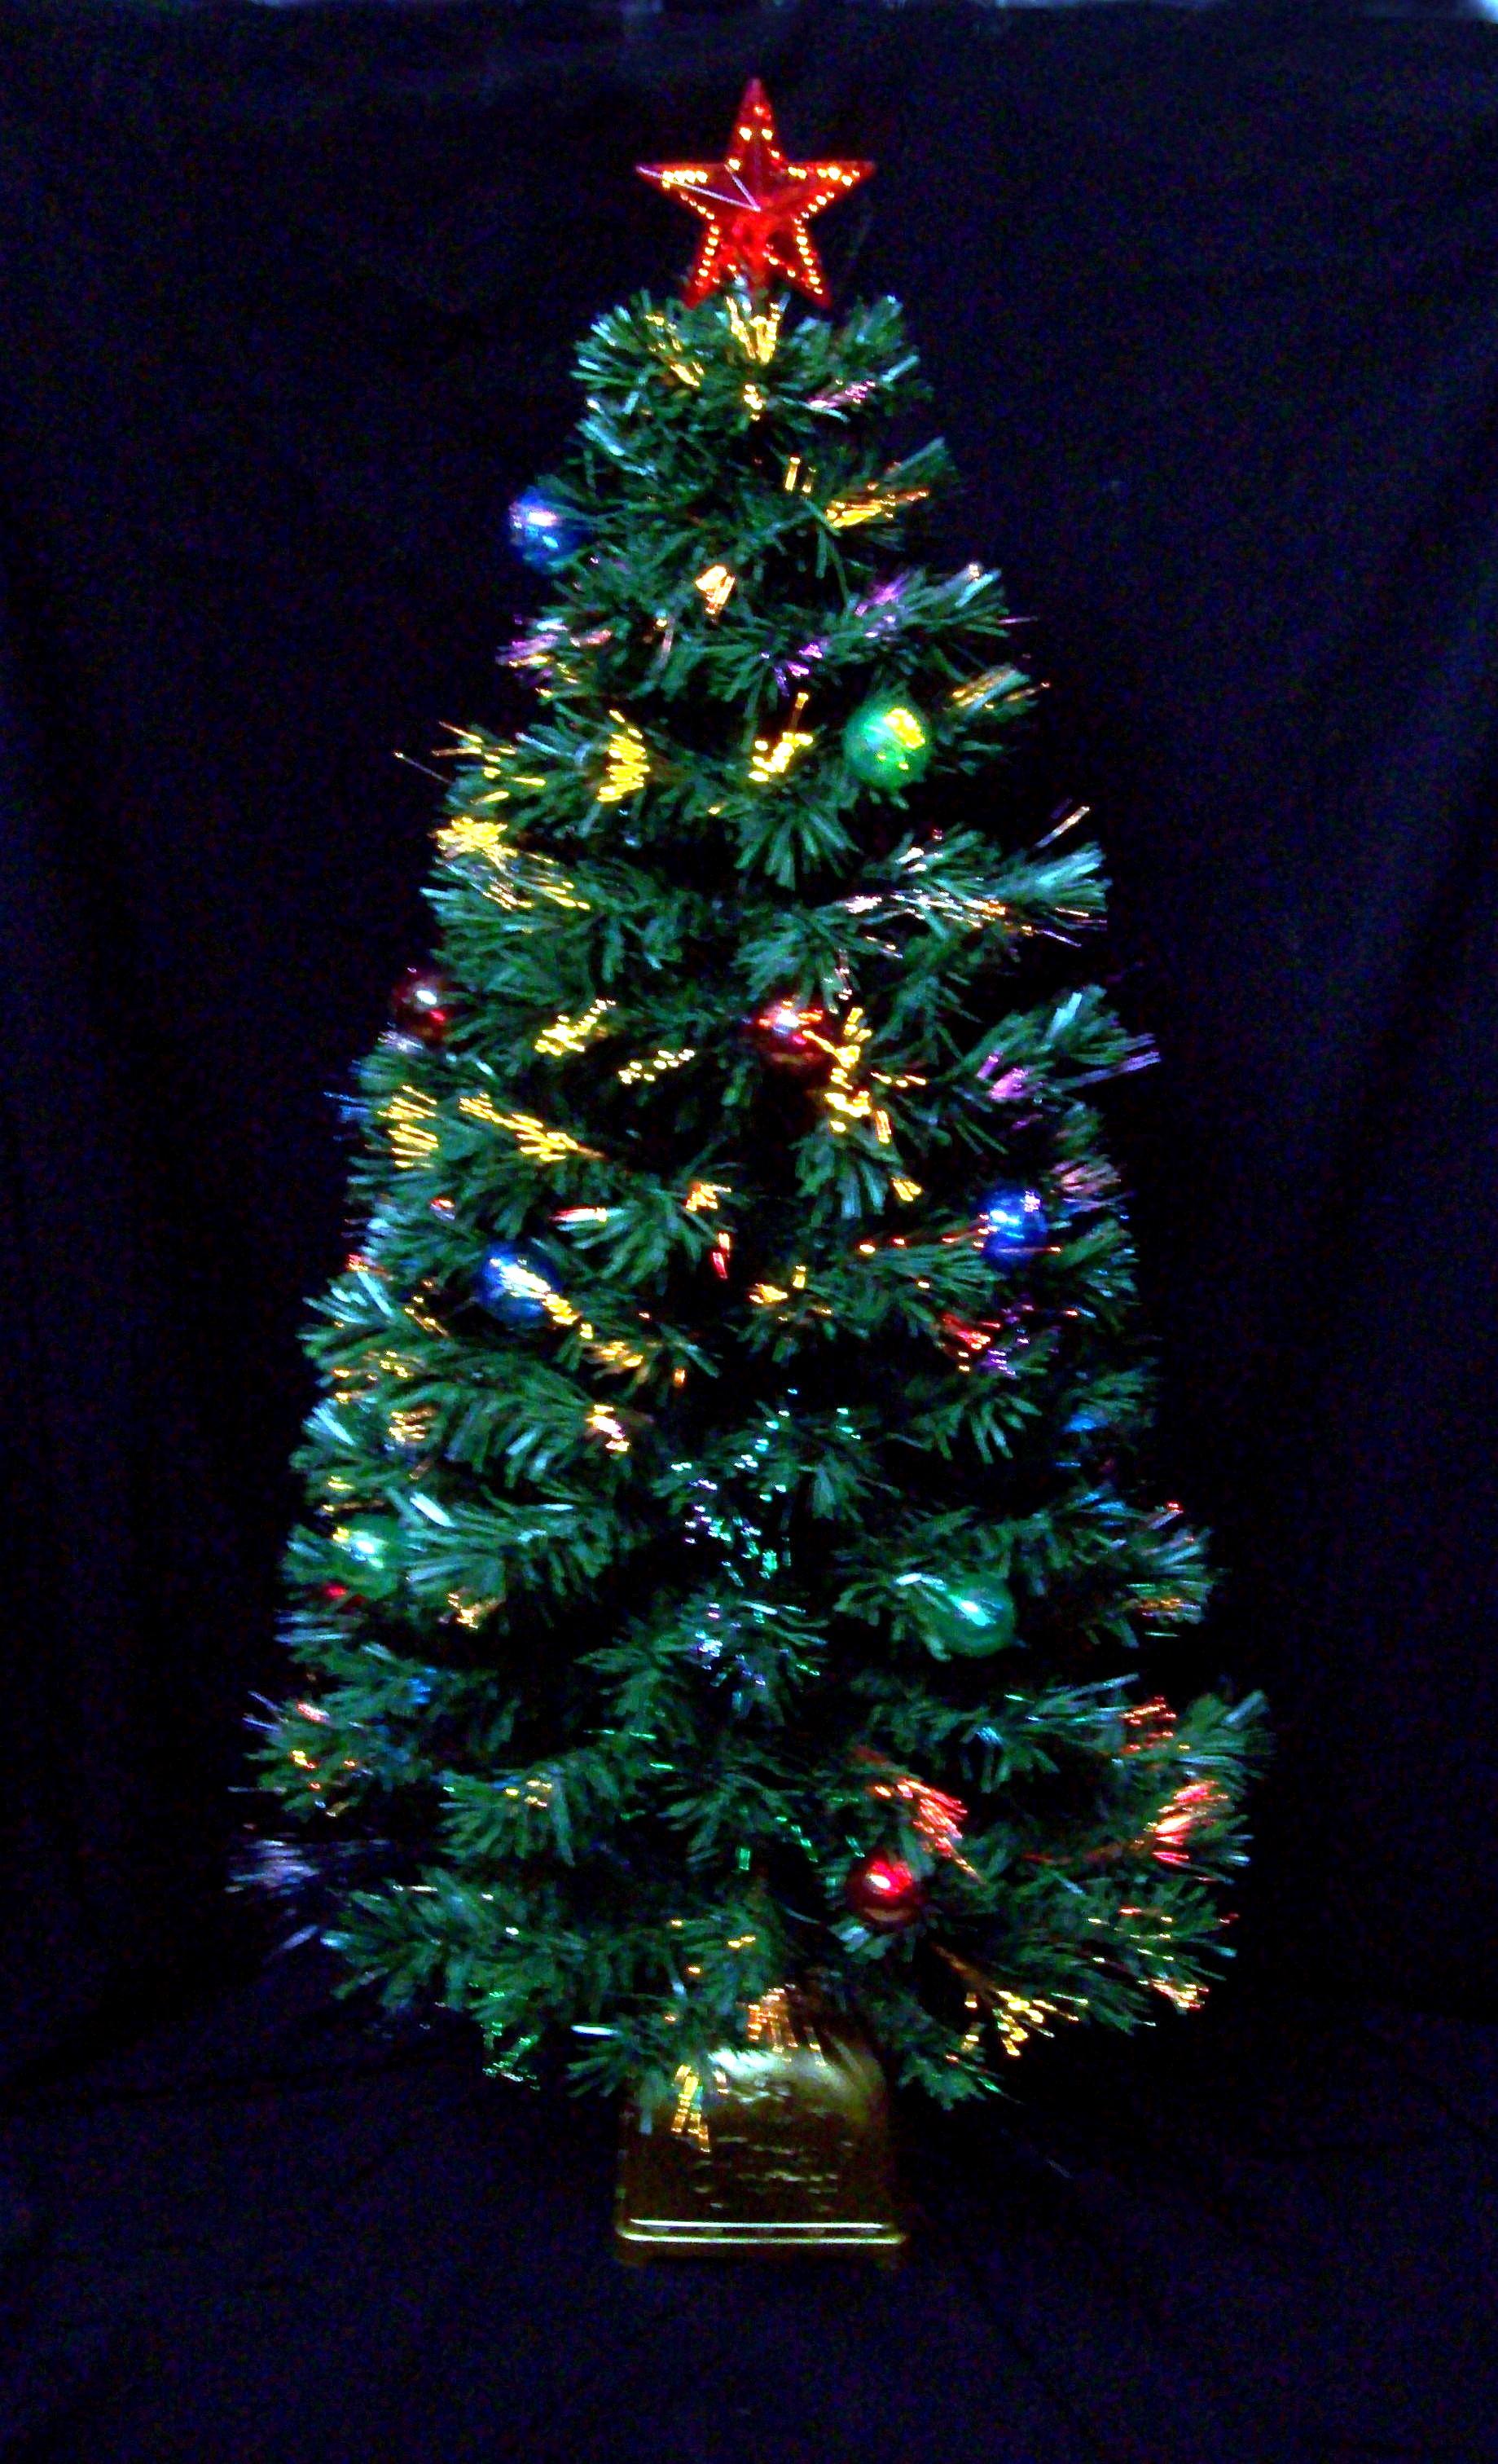 , елка-световод, оптоволоконная елка ...: www.ikolyaski.ru/index.php?mtype=shop1&mid=1416